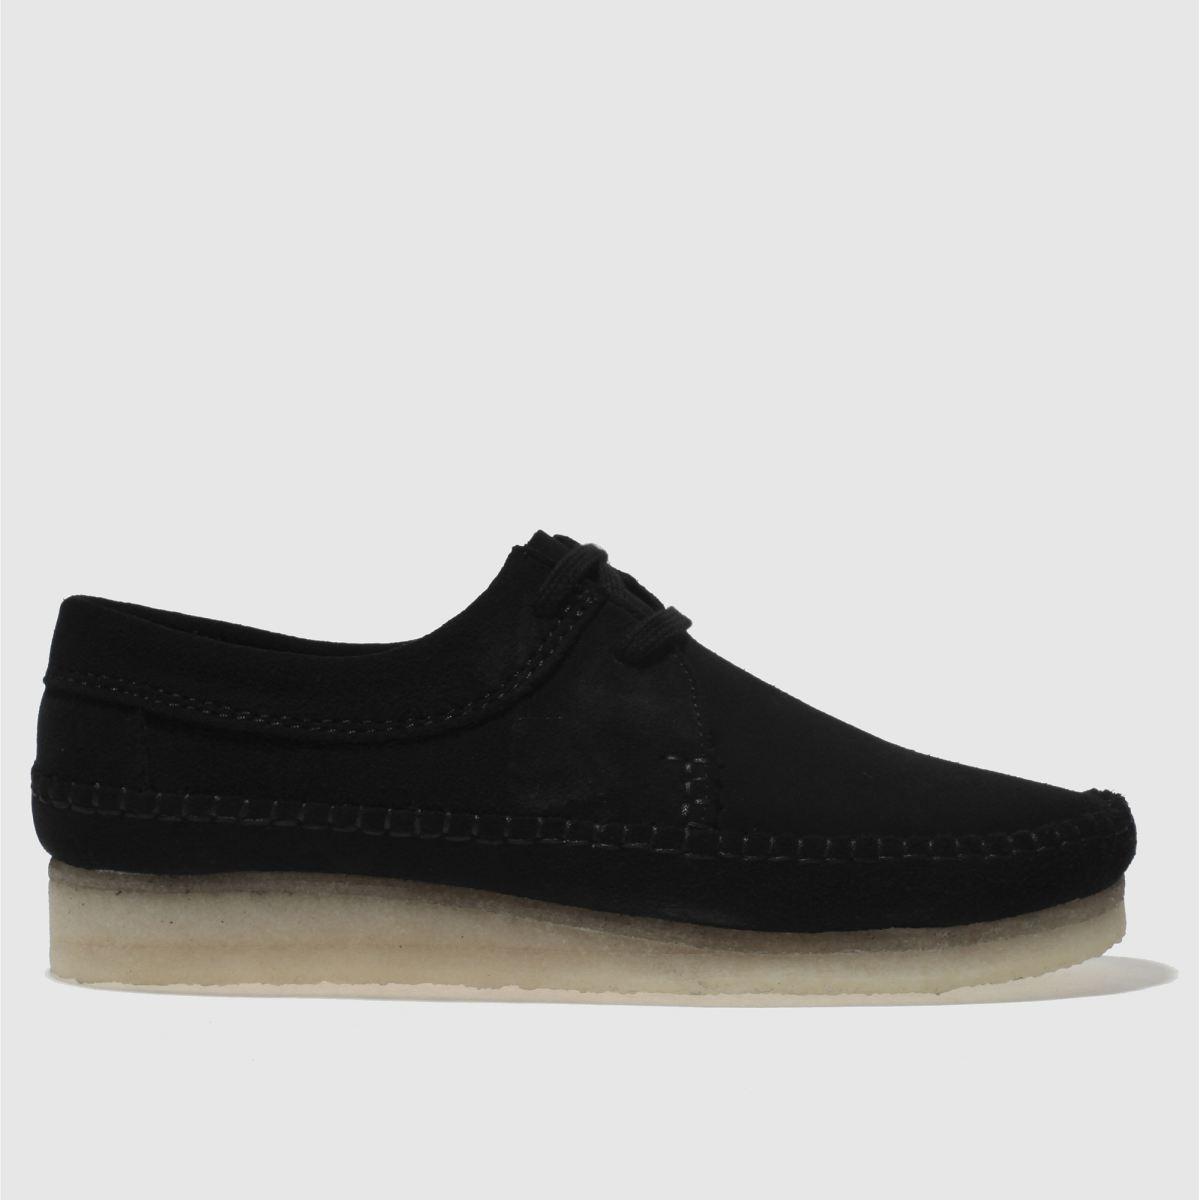 Clarks Originals Black Weaver Shoes